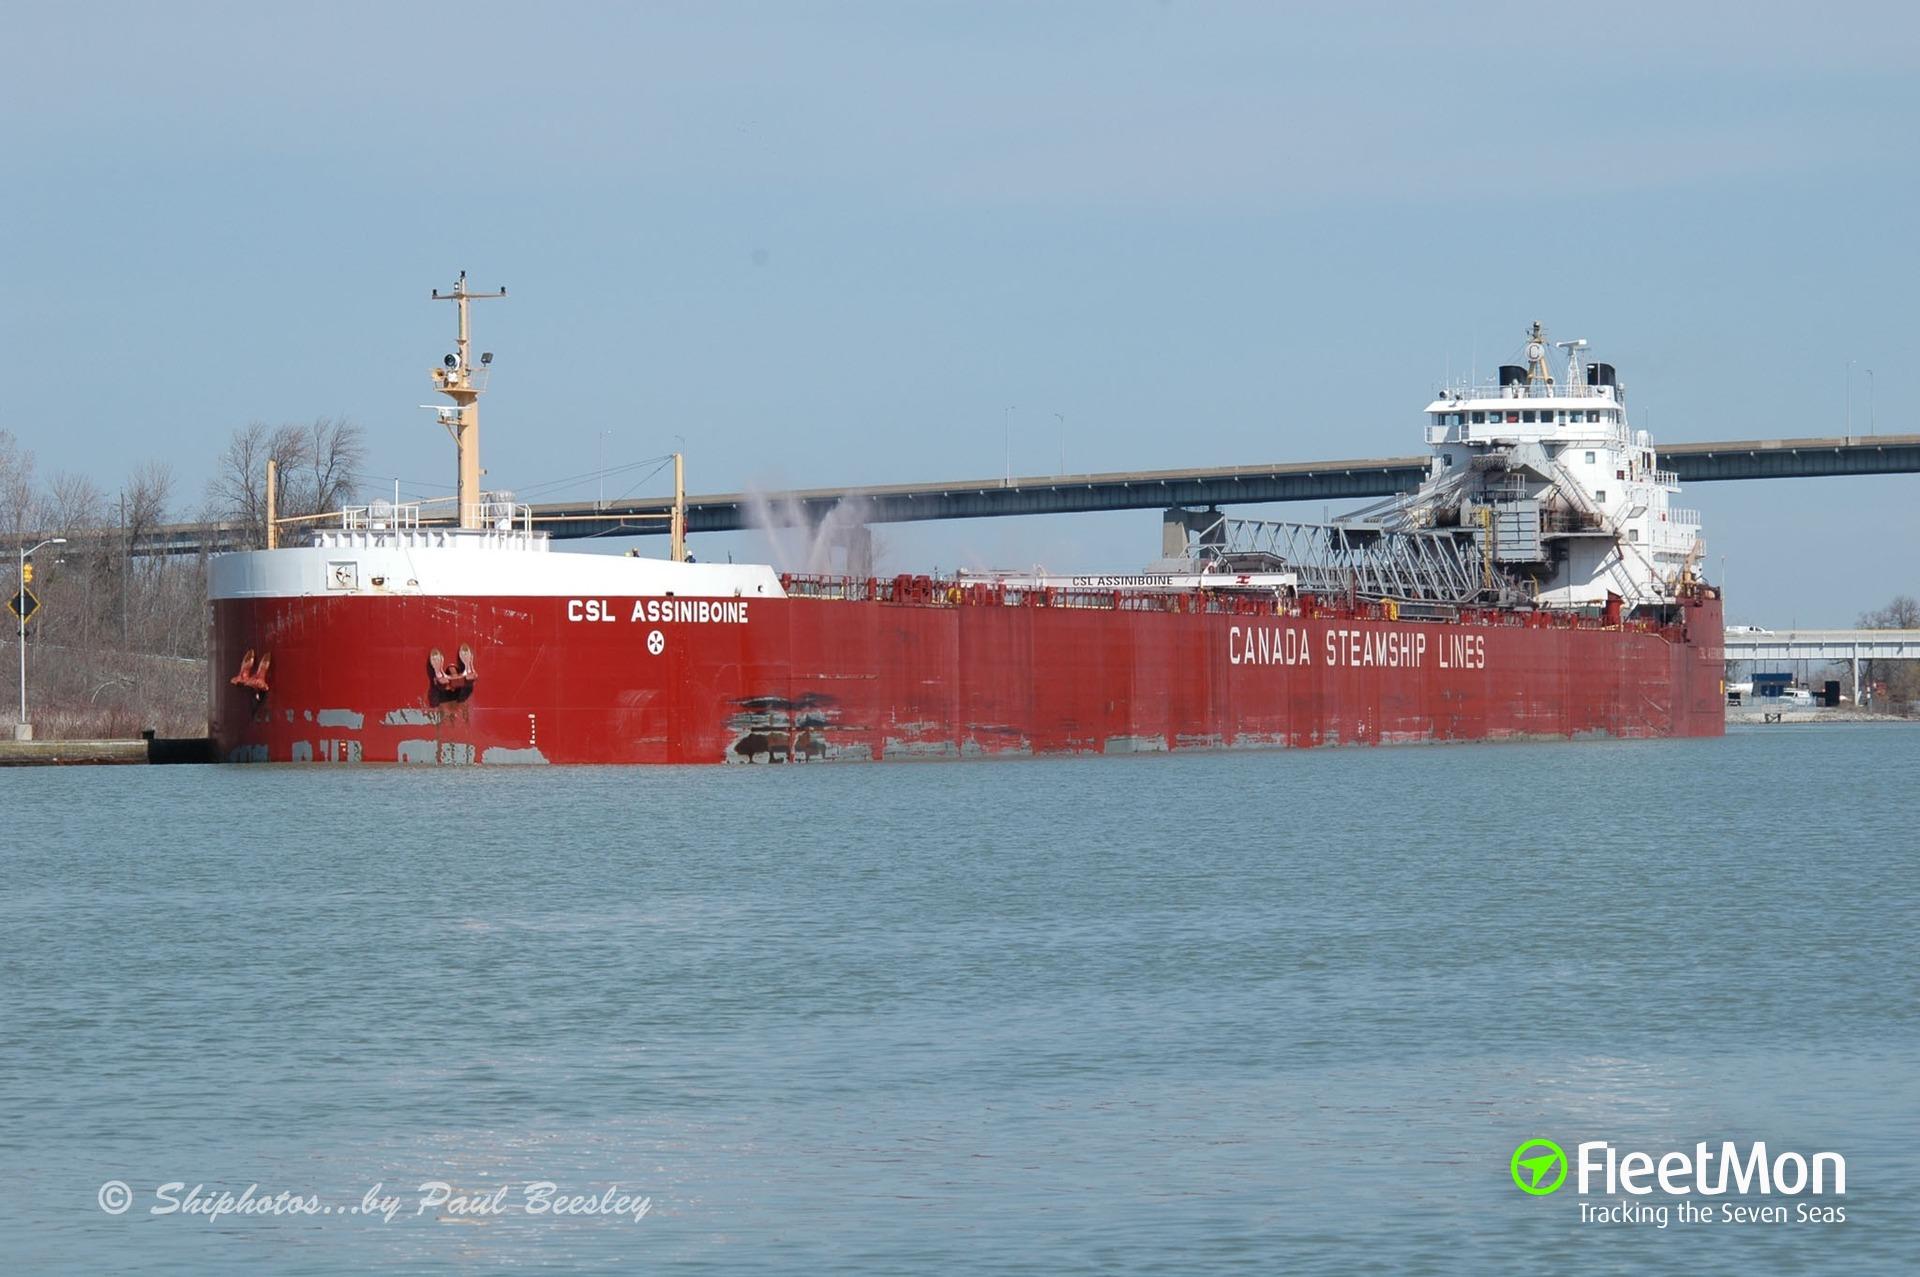 Photo of CSL ASSINIBOINE (IMO: 7413218. MMSI: 316001633. Callsign: VCKQ) taken by Shiphotos